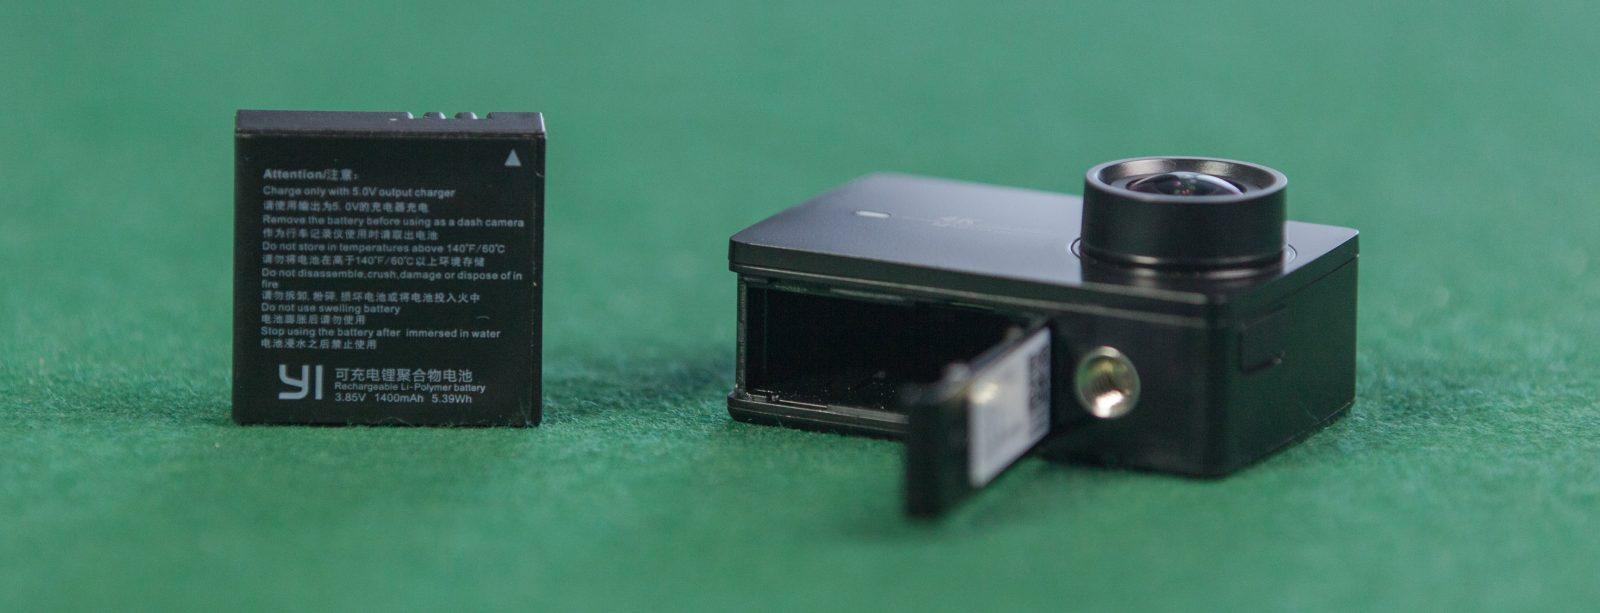 Батарея для Xiaomi Yi 4K